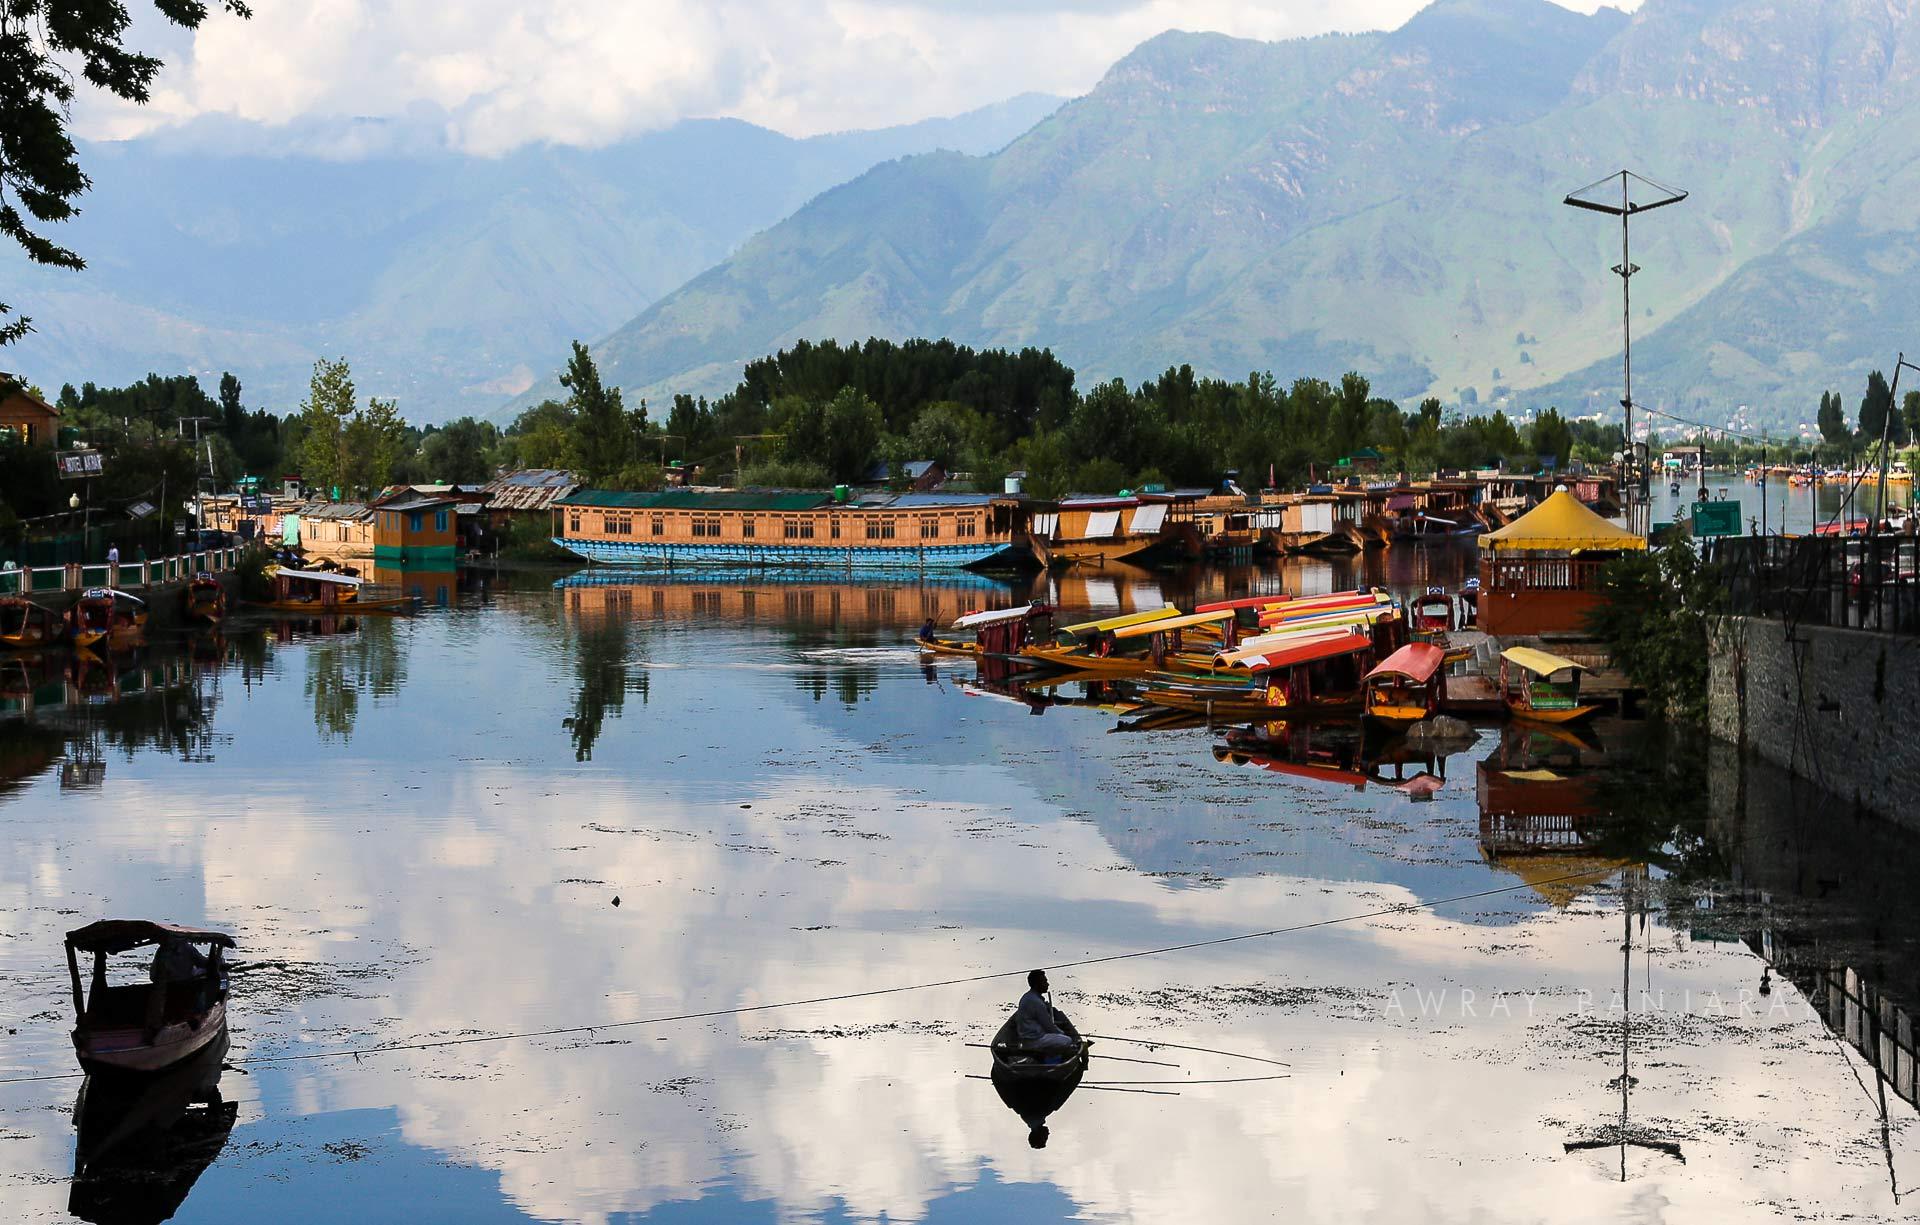 Bawray Banjaray In Srinagar